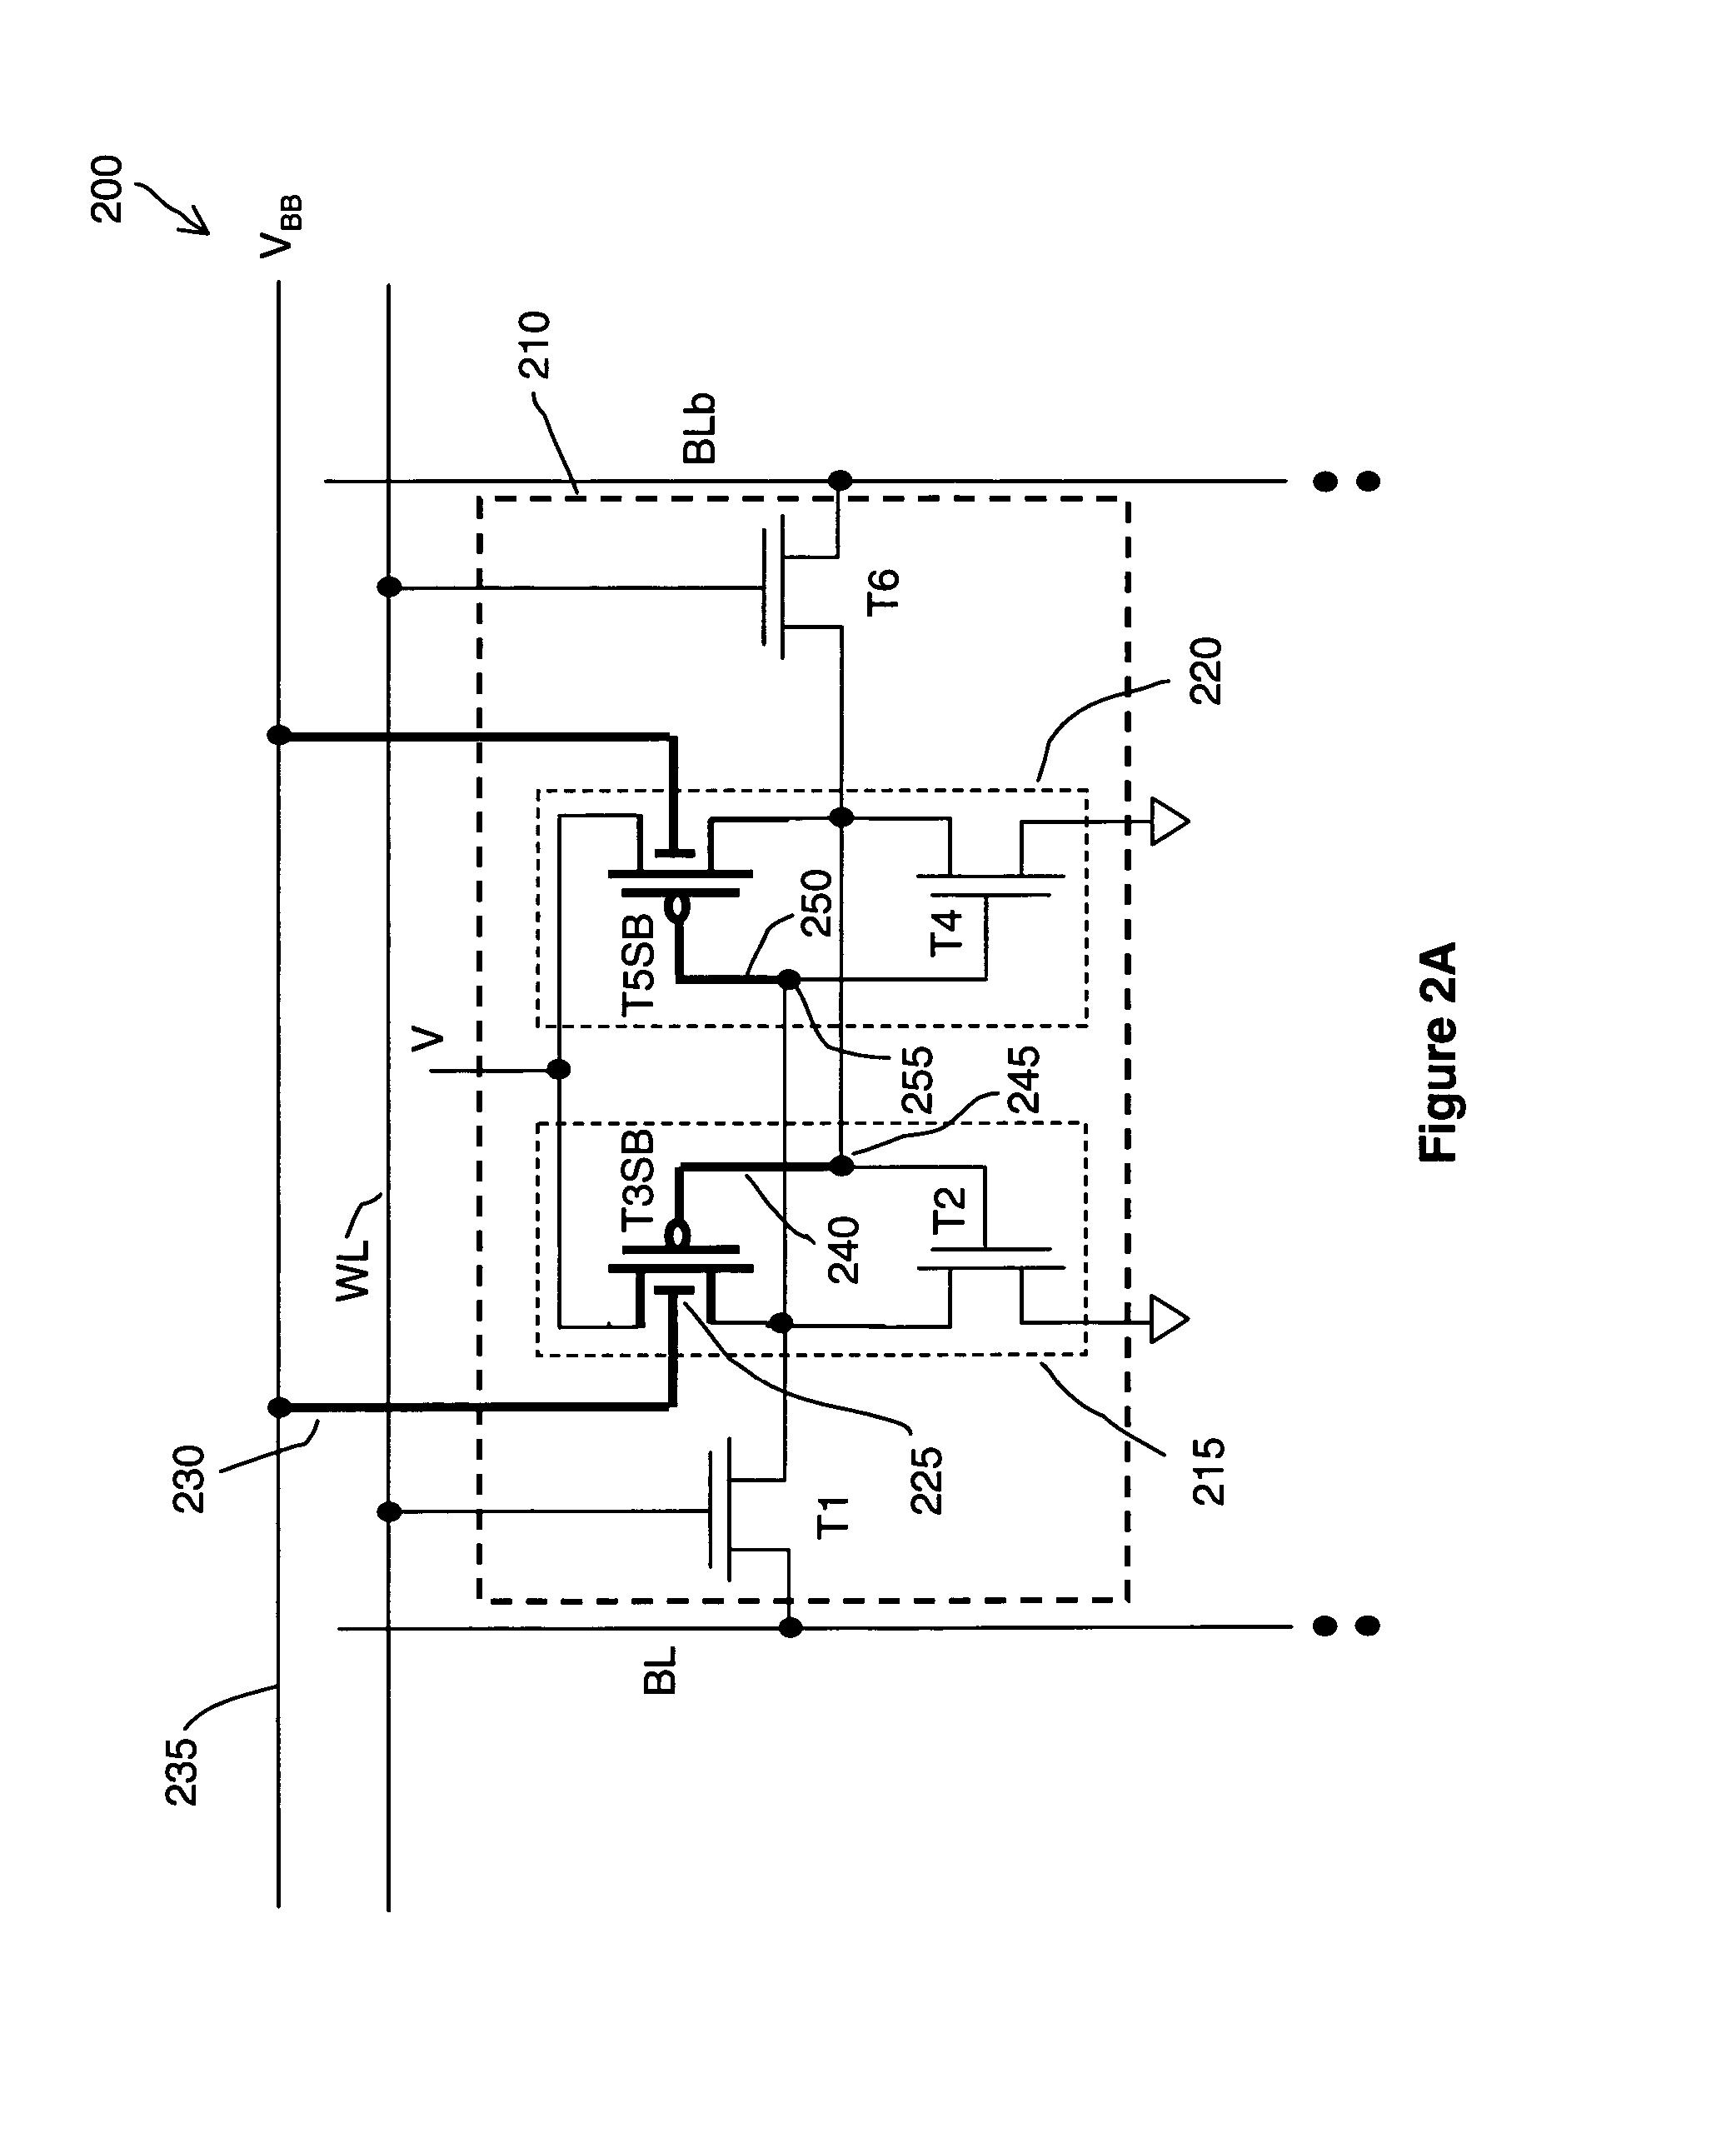 Patente Us7598544 Hybrid Carbon Nanotude Fetcnfet Fet Static Ram Electronics Tutorial Sections 1620 Patent Drawing